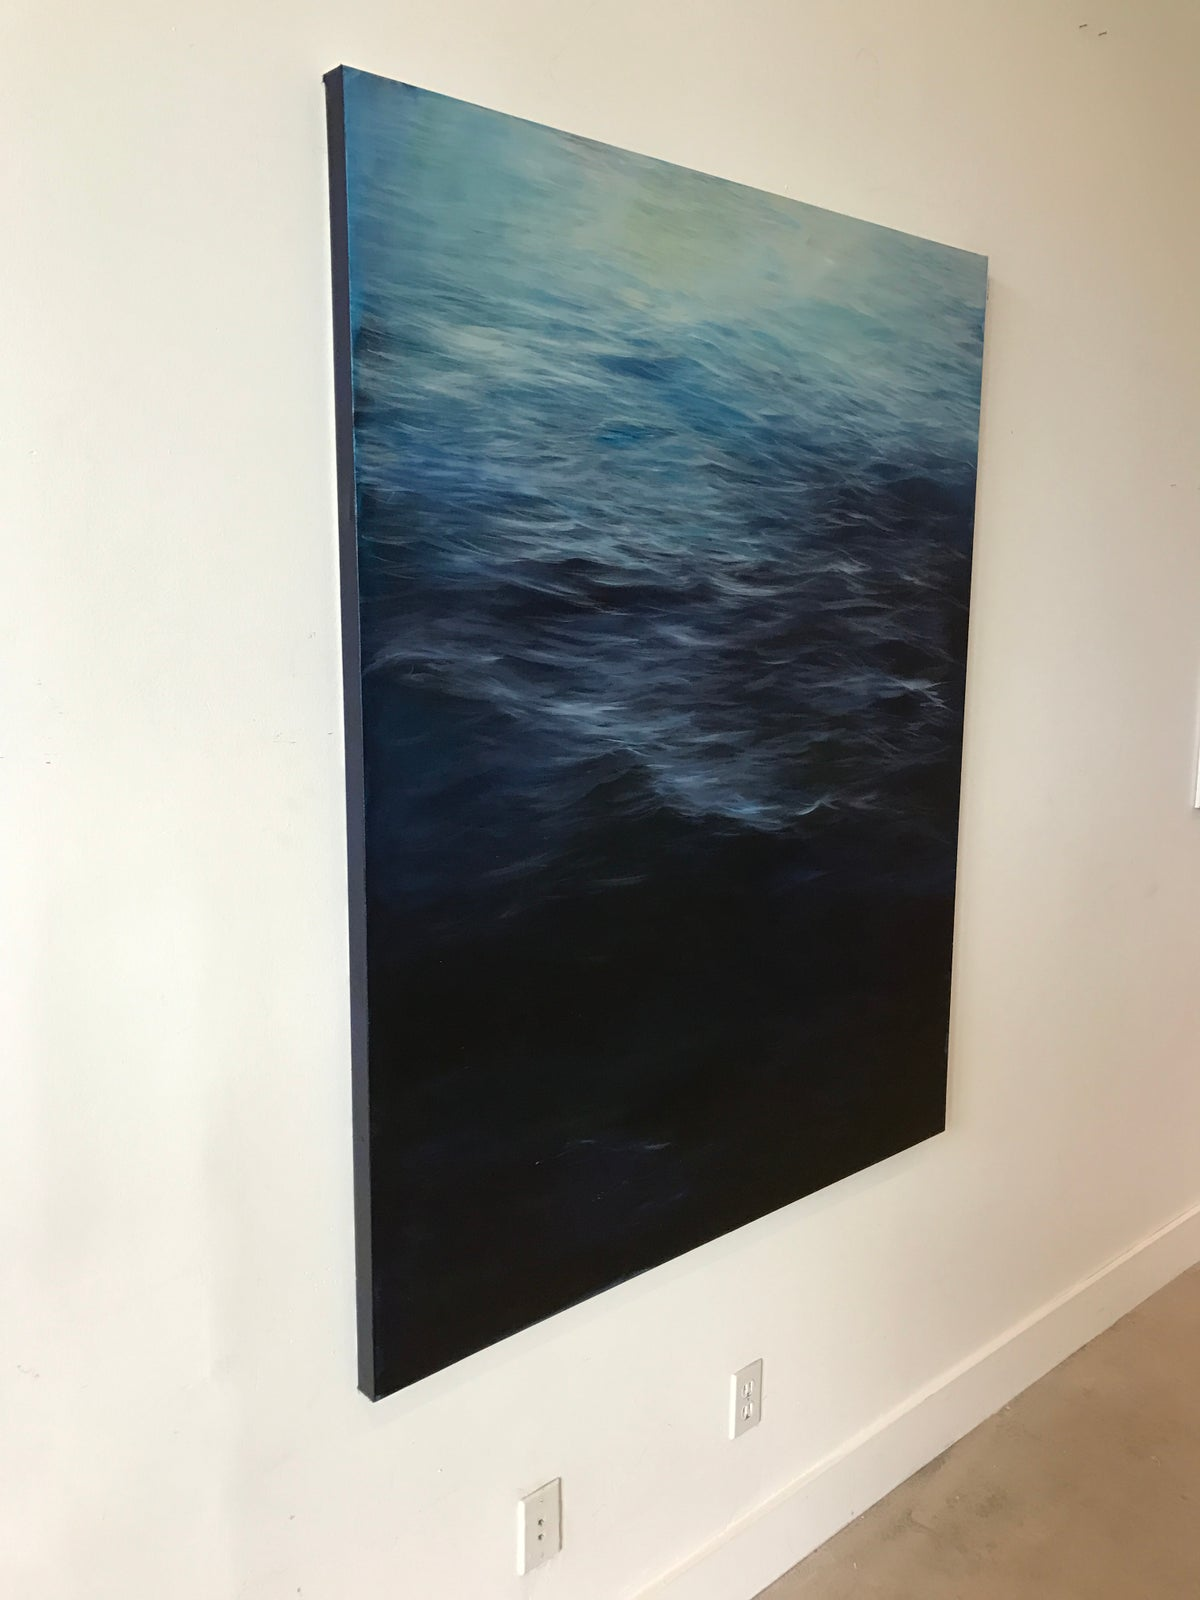 Image of Water No. 17